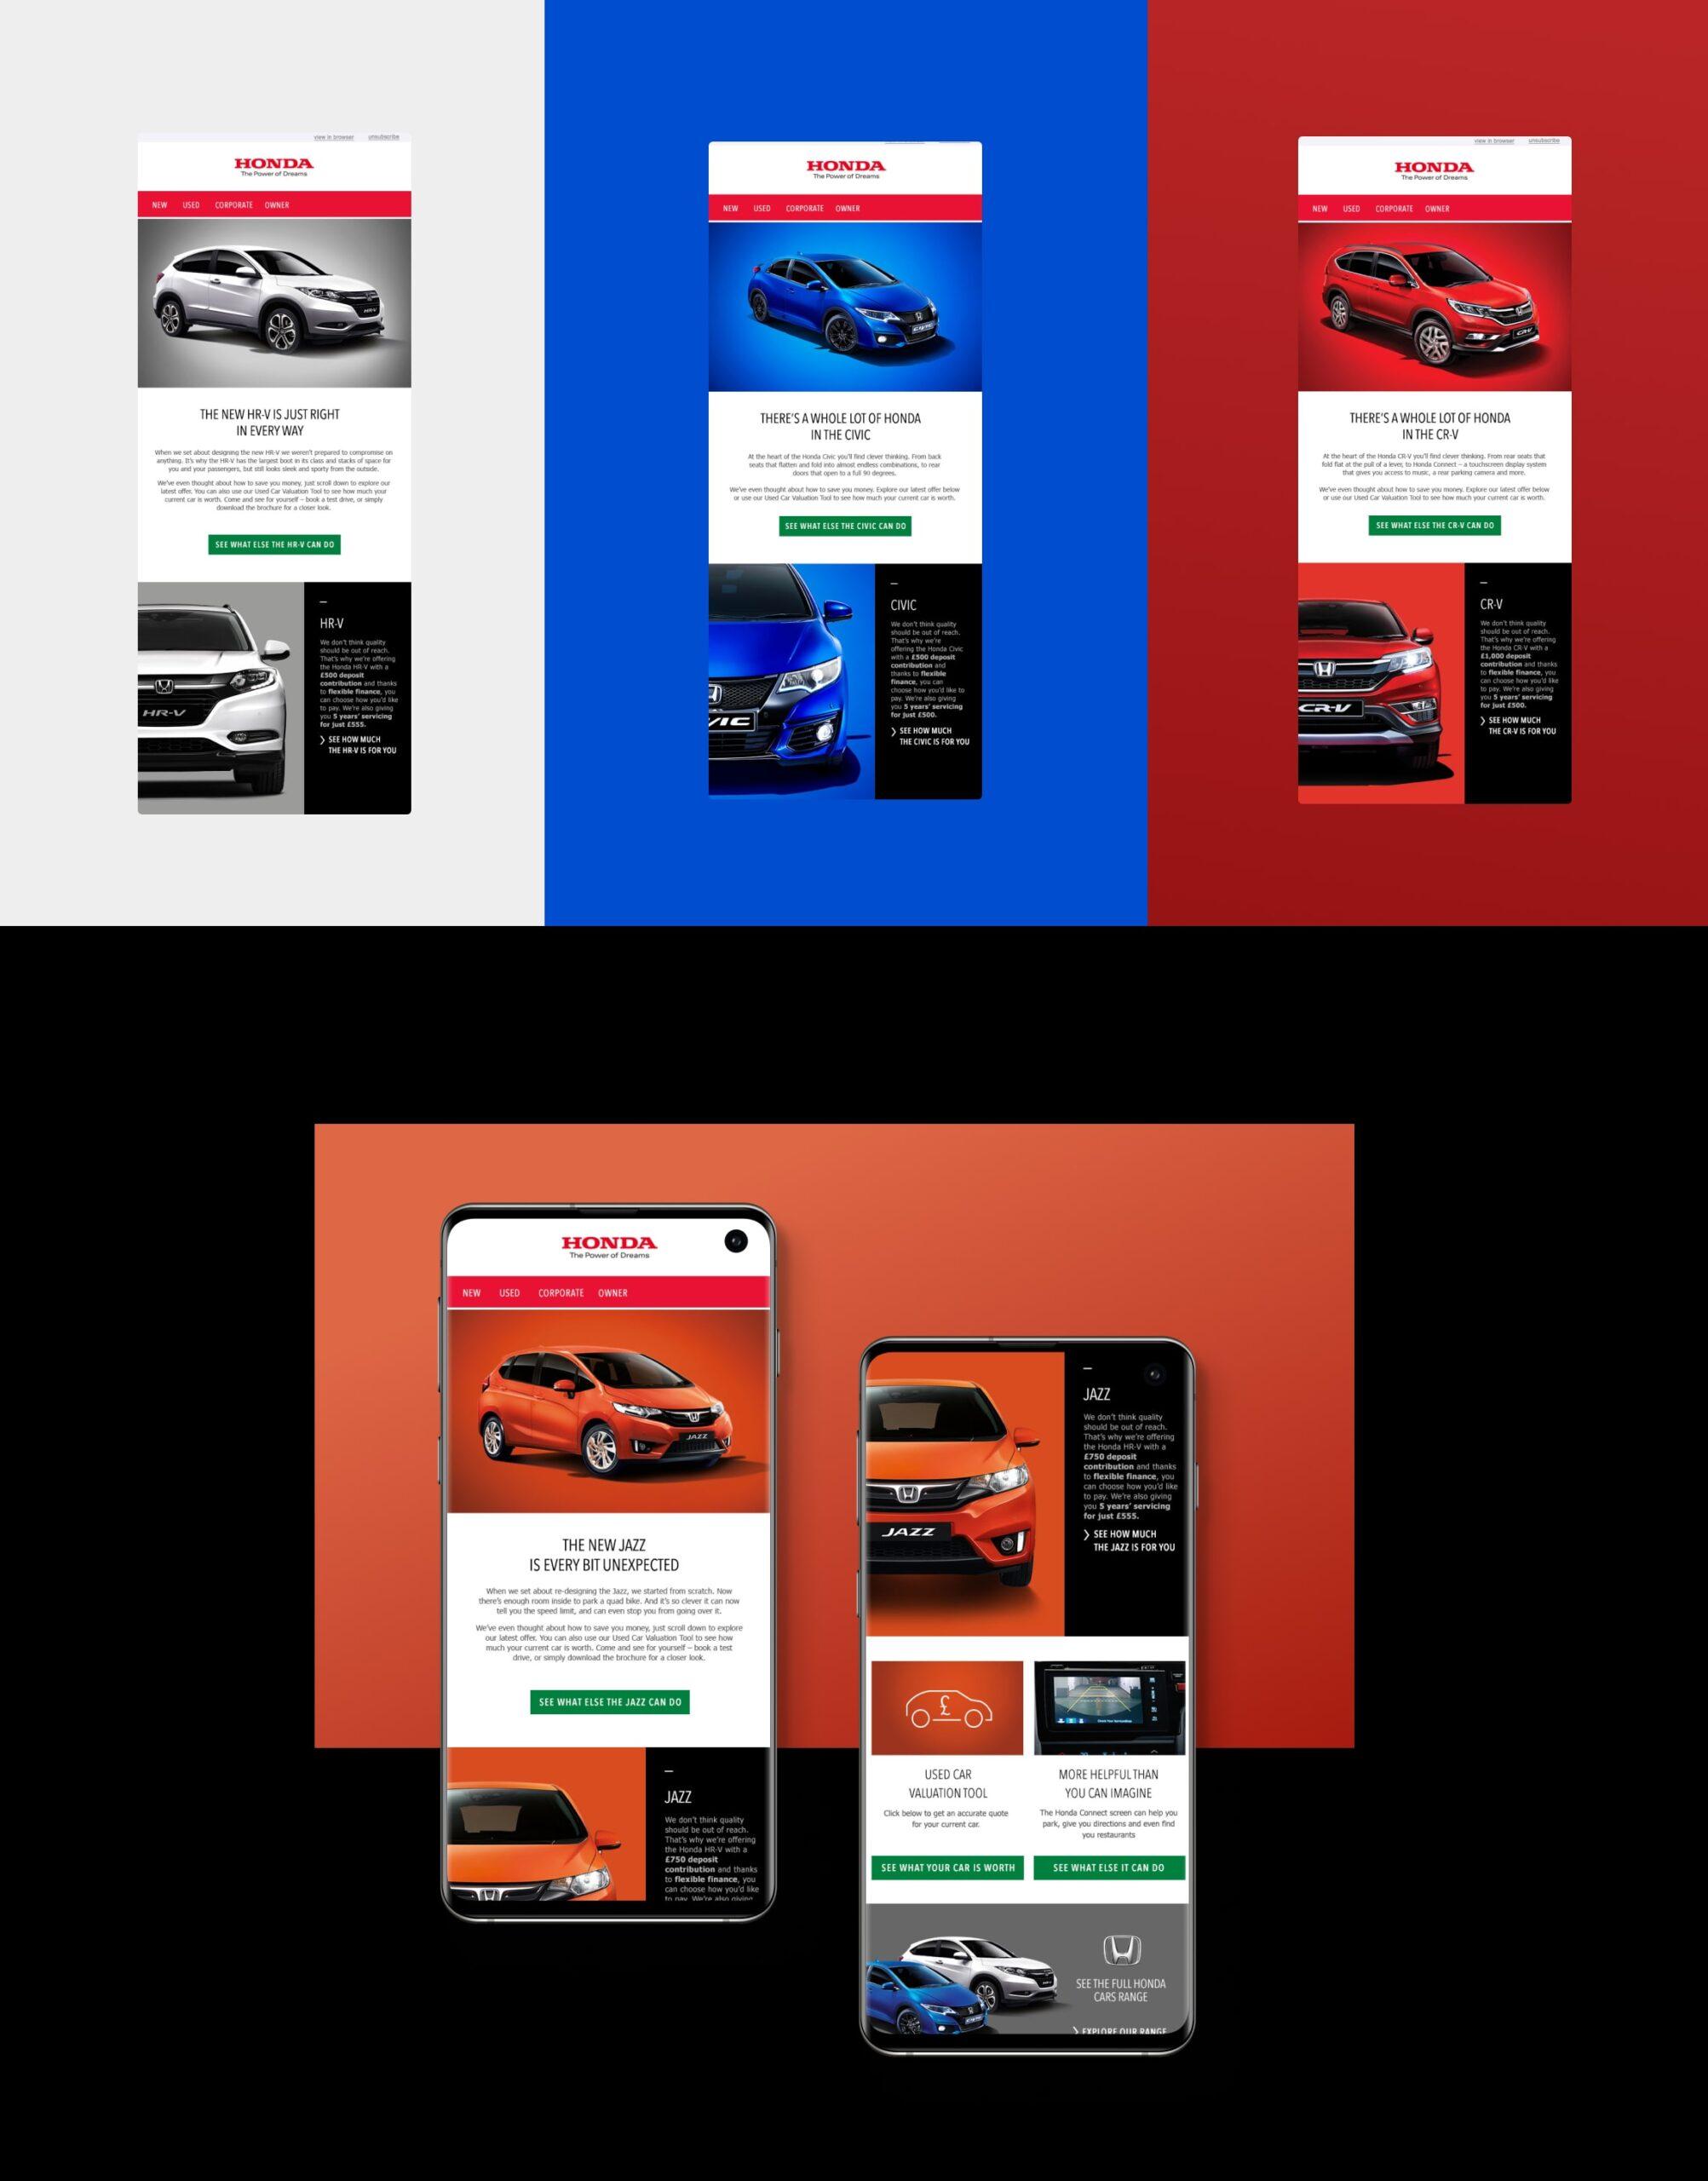 Honda-1_designs